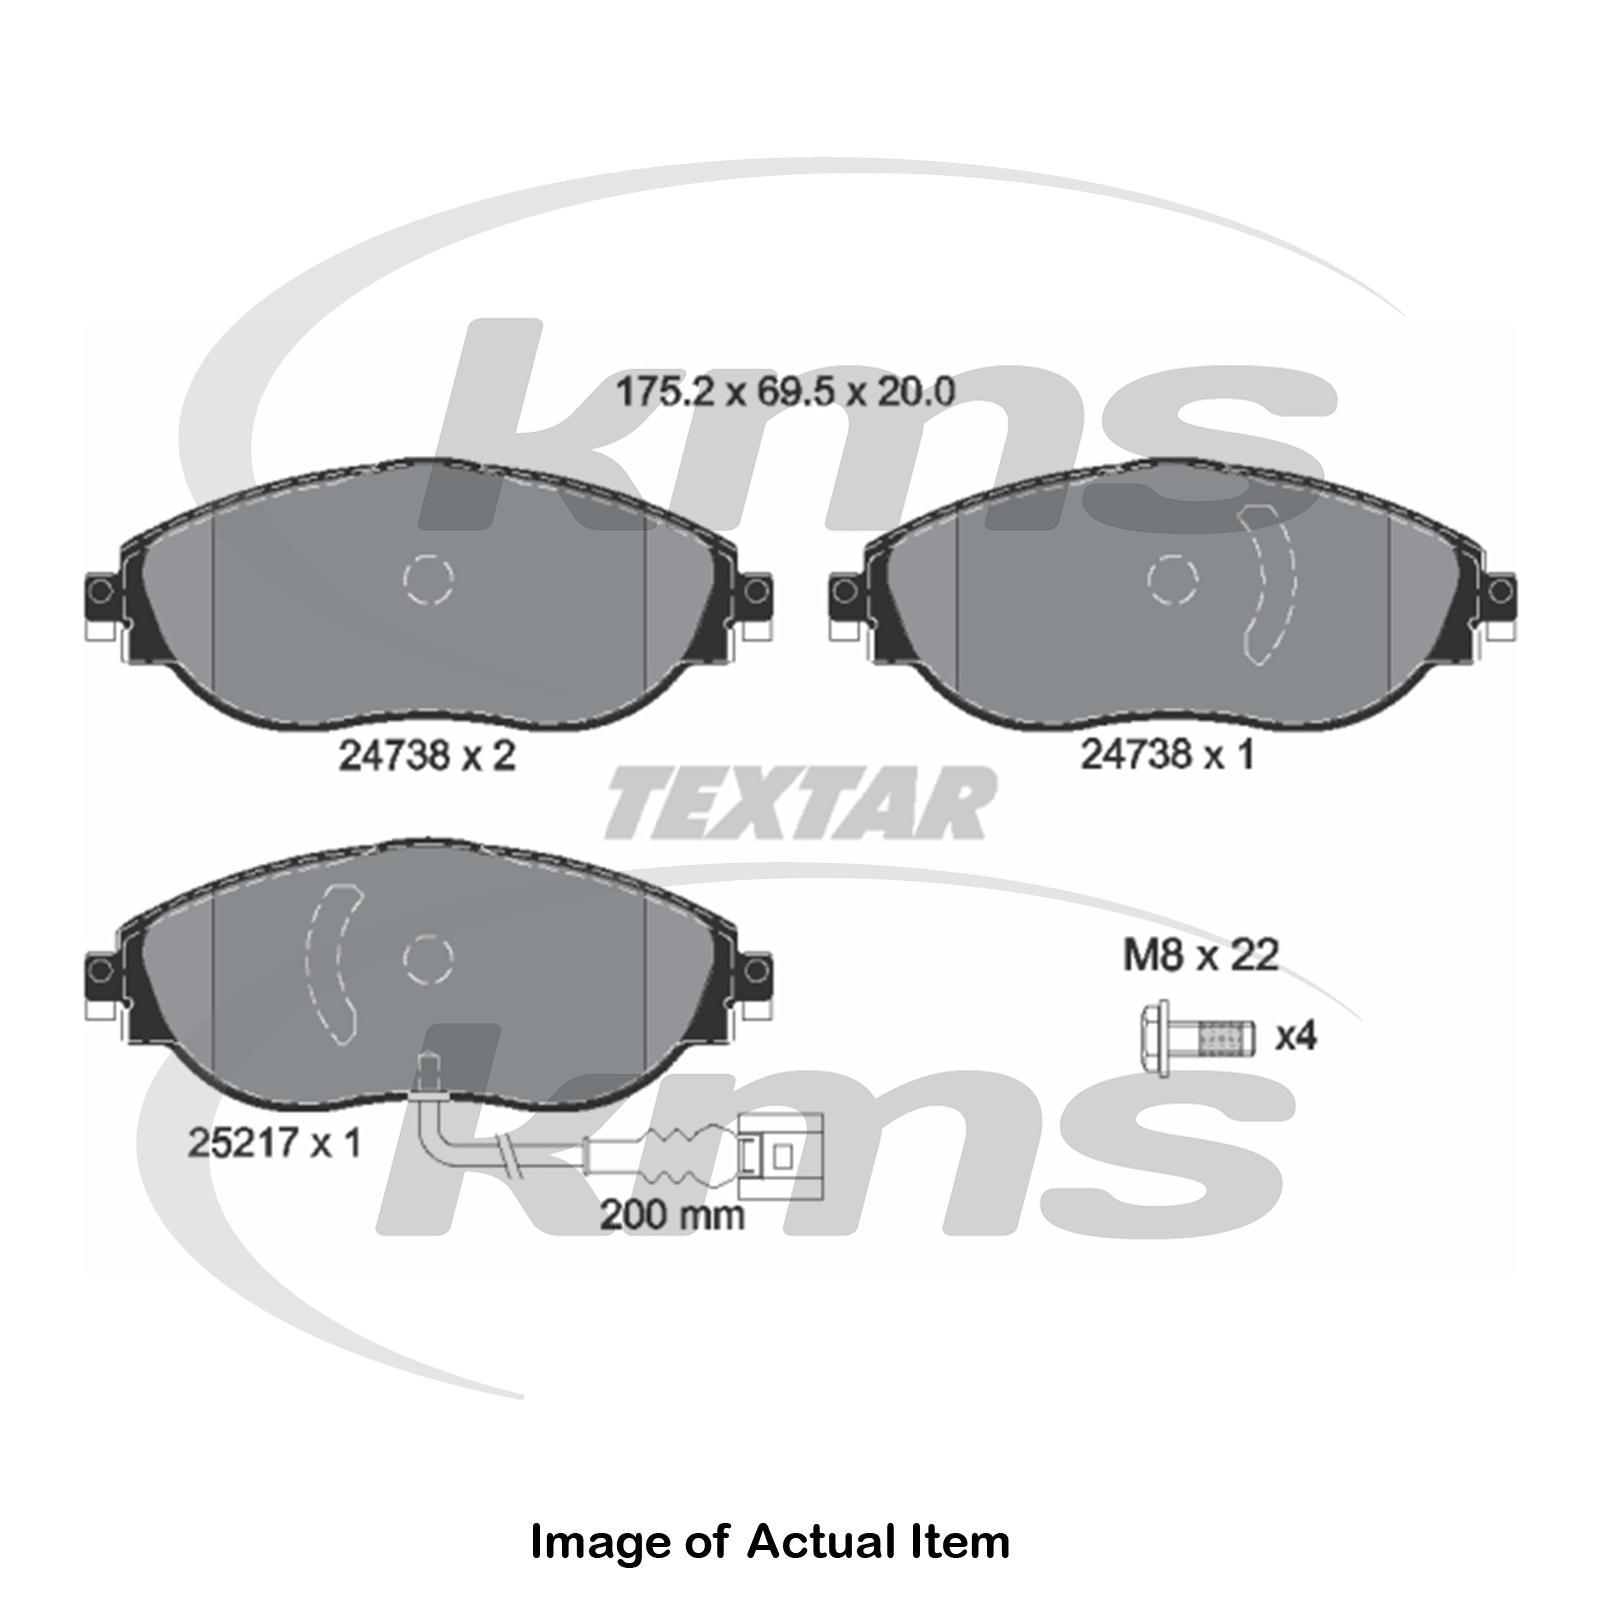 GENUINE Mintex Front Brake Pad Set MDB3173 5 YEAR WARRANTY BRAND NEW